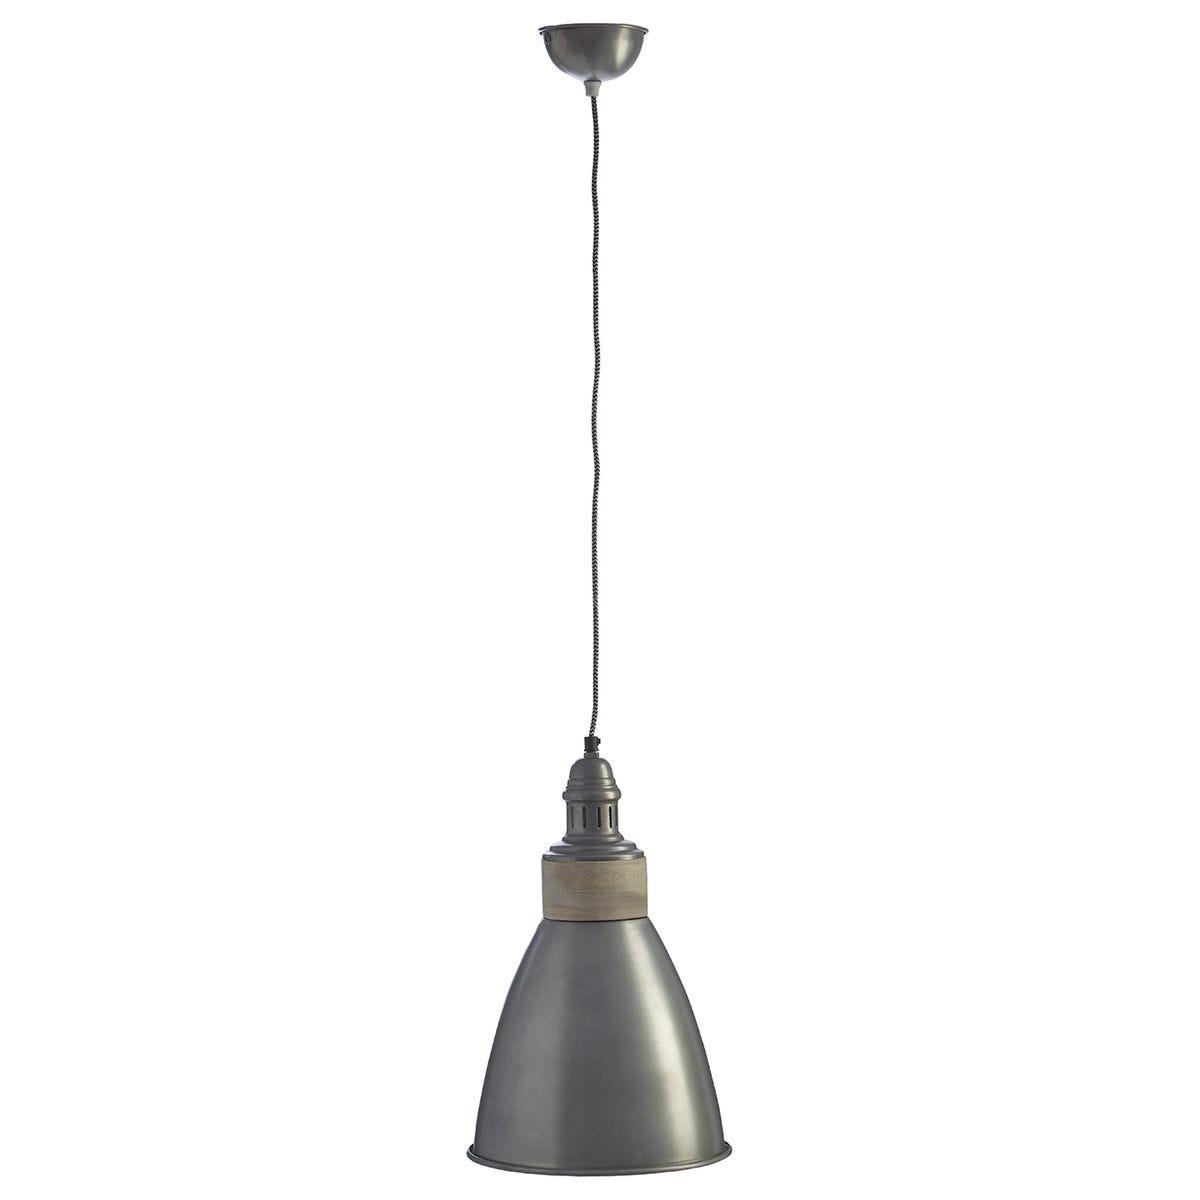 Premier Housewares Oslo Pendant Light in Iron/Wood - Zinc Finish